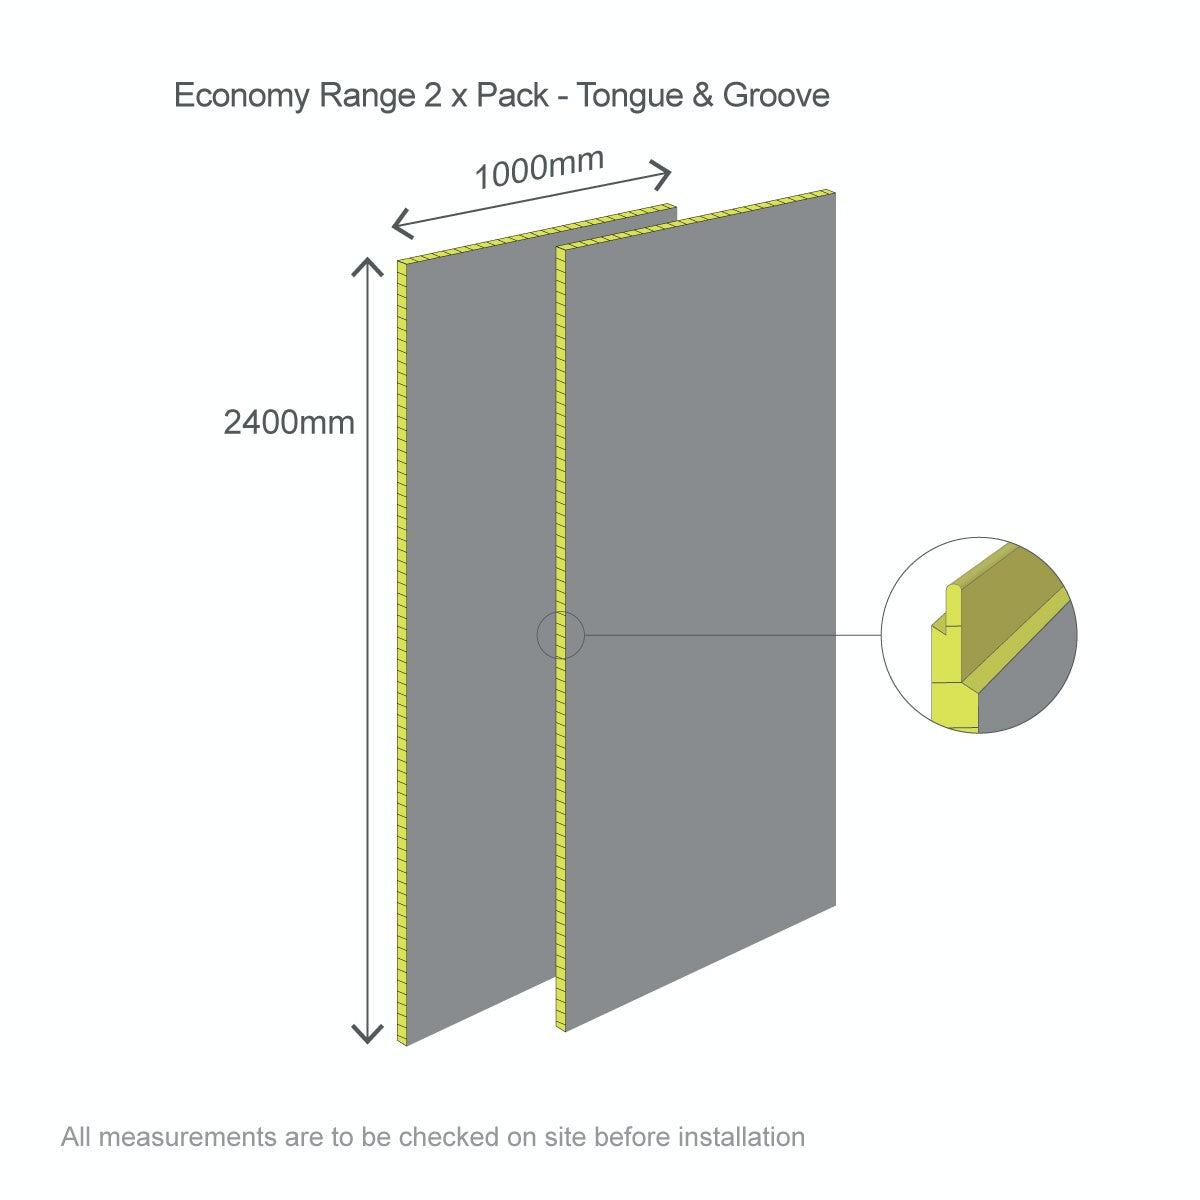 Dimensions for Multipanel Economy Sunlit Quartz shower wall 2 panel pack